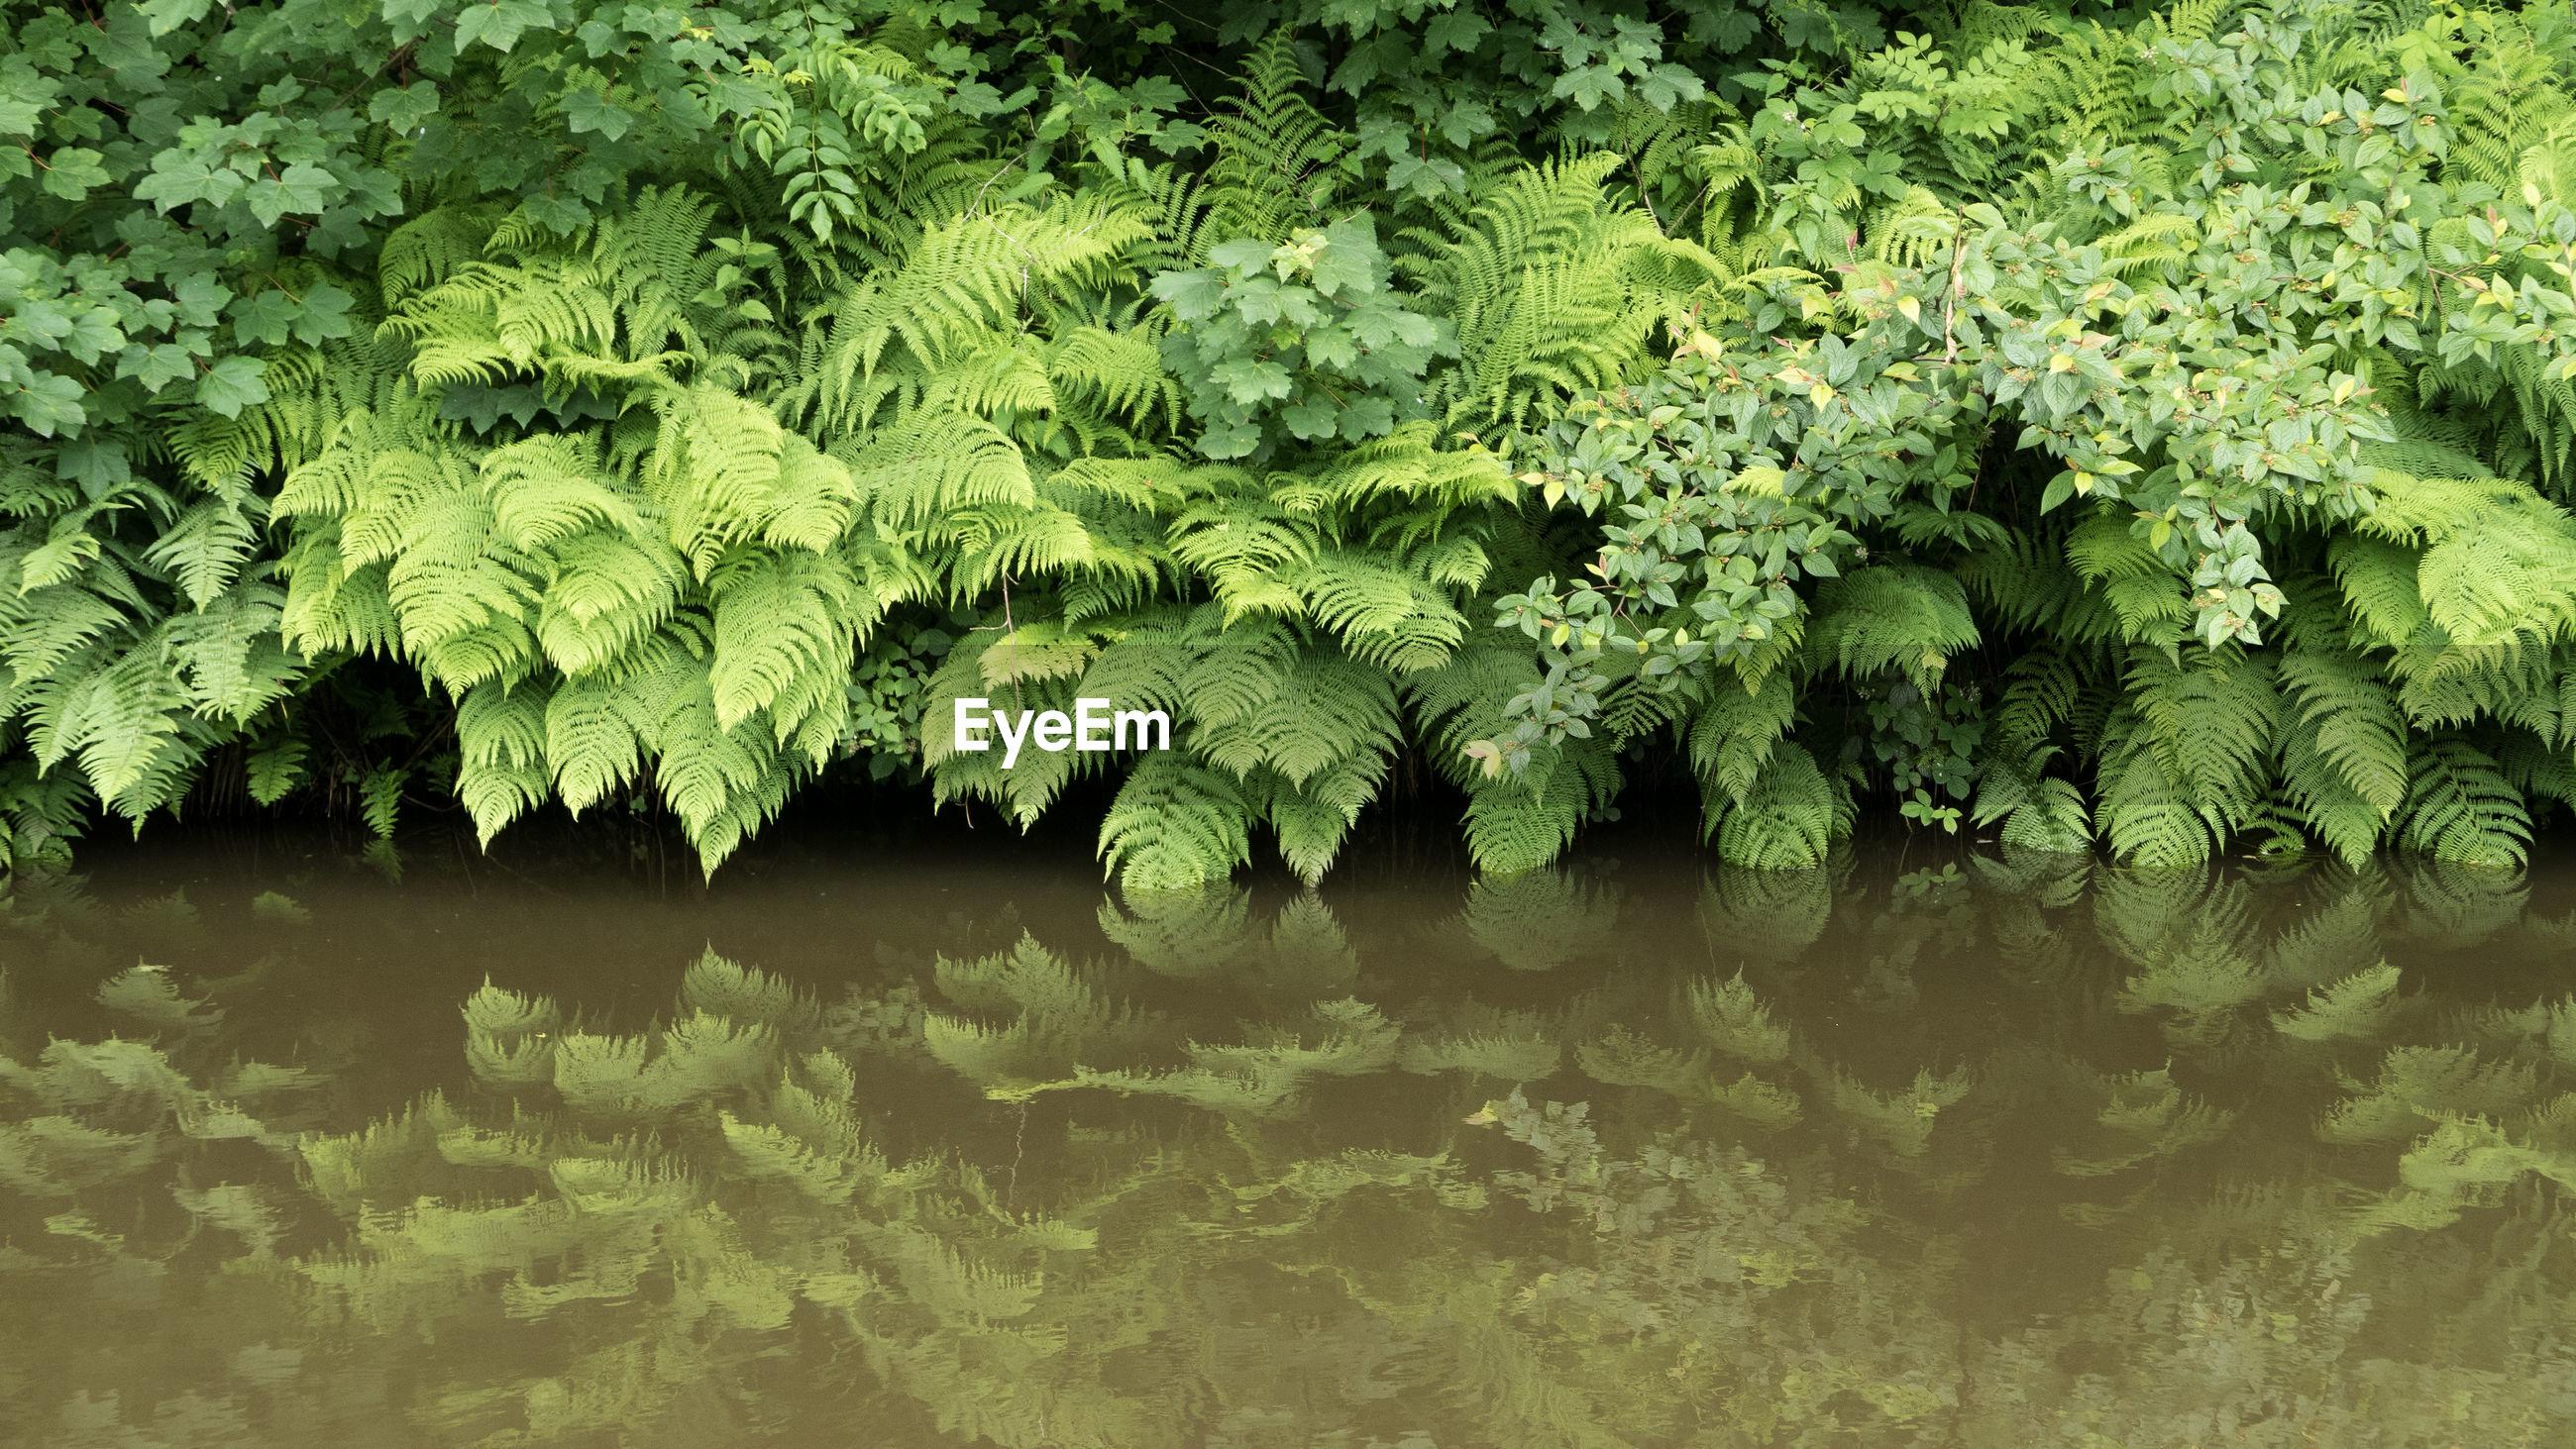 PLANTS GROWING ON RIVERBANK